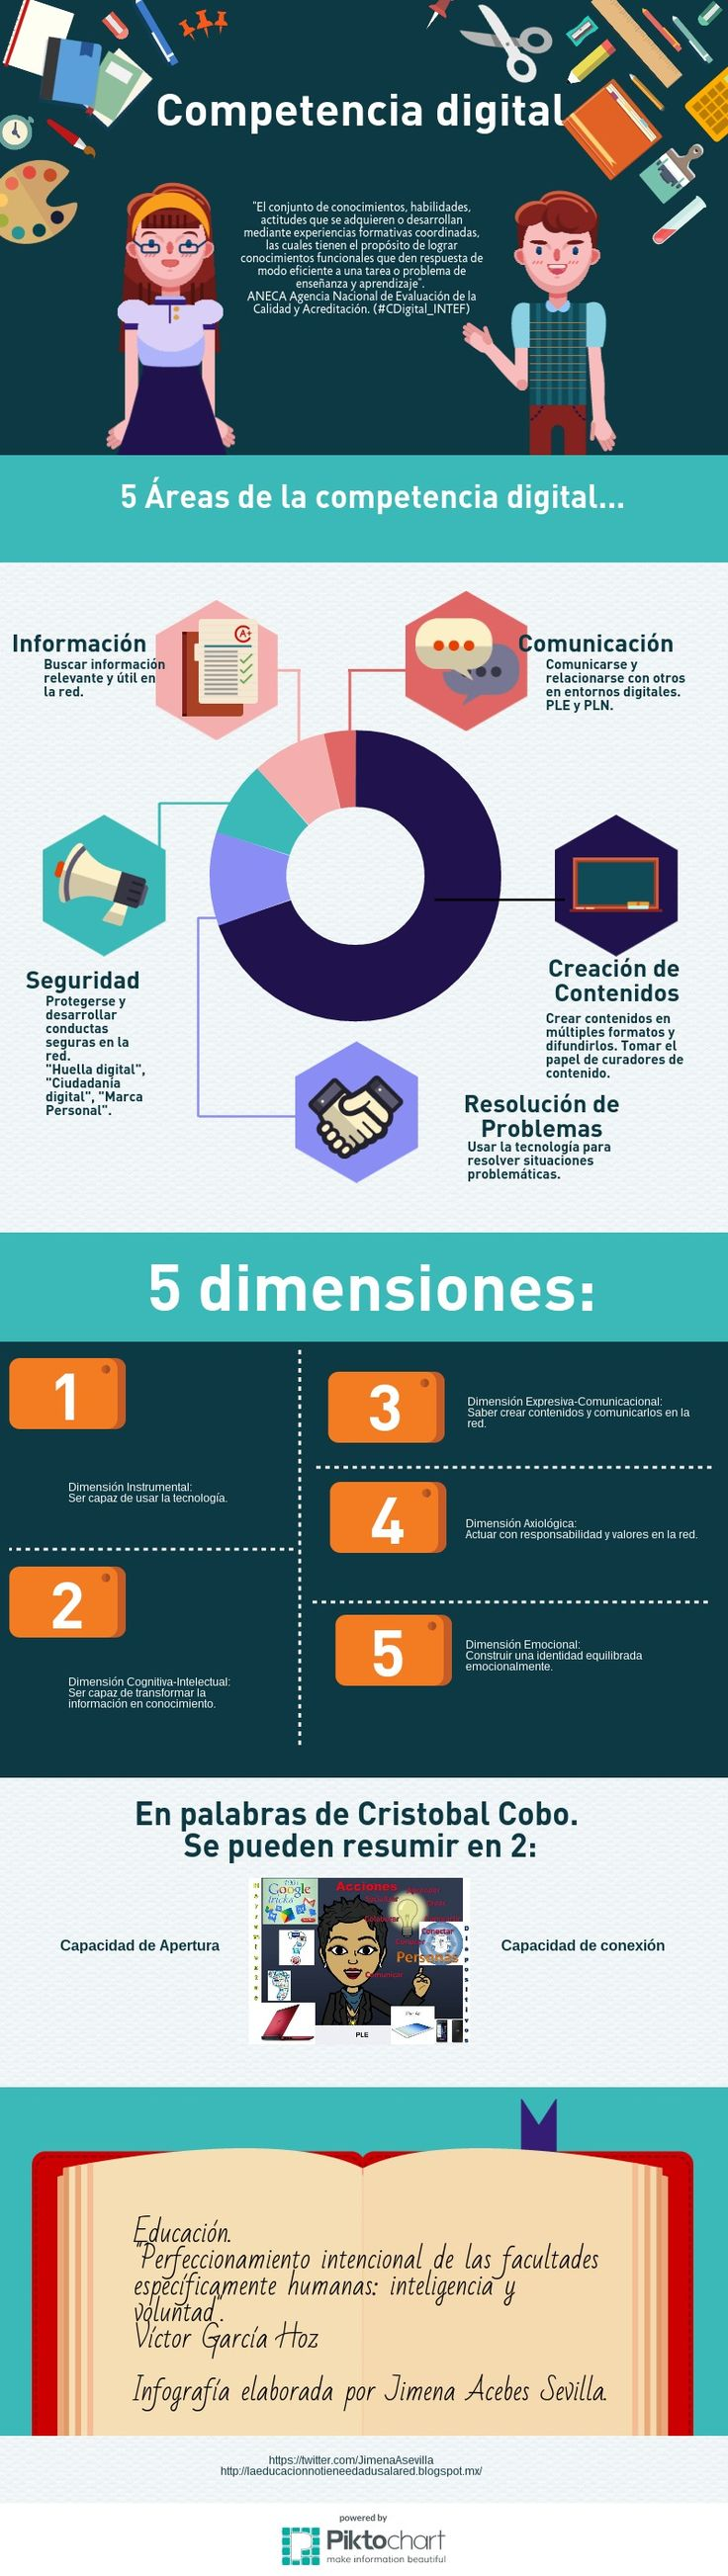 Competencia Digital | Piktochart Infographic Editor